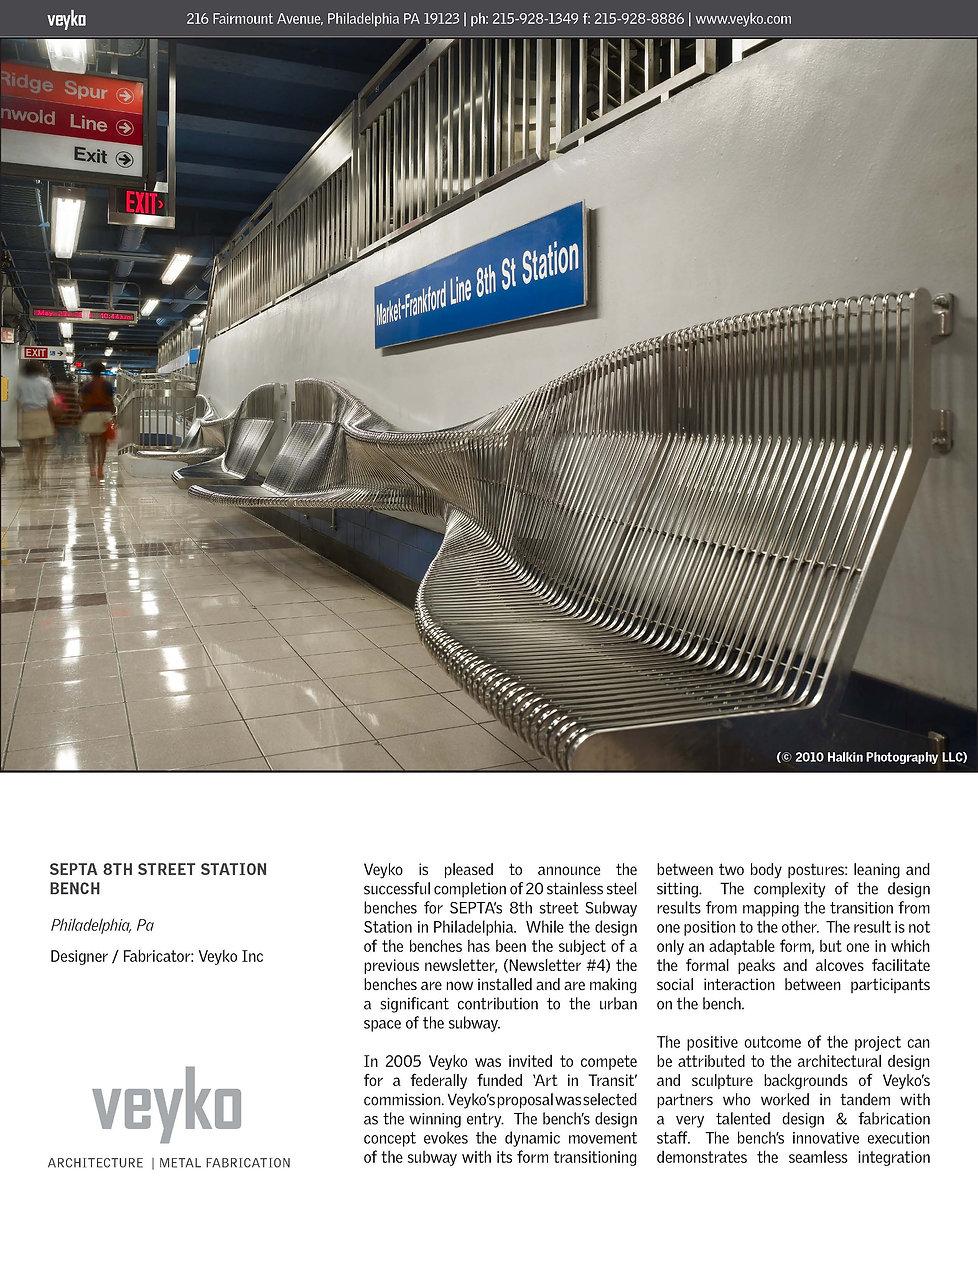 Issue 8 Septa p1.jpg